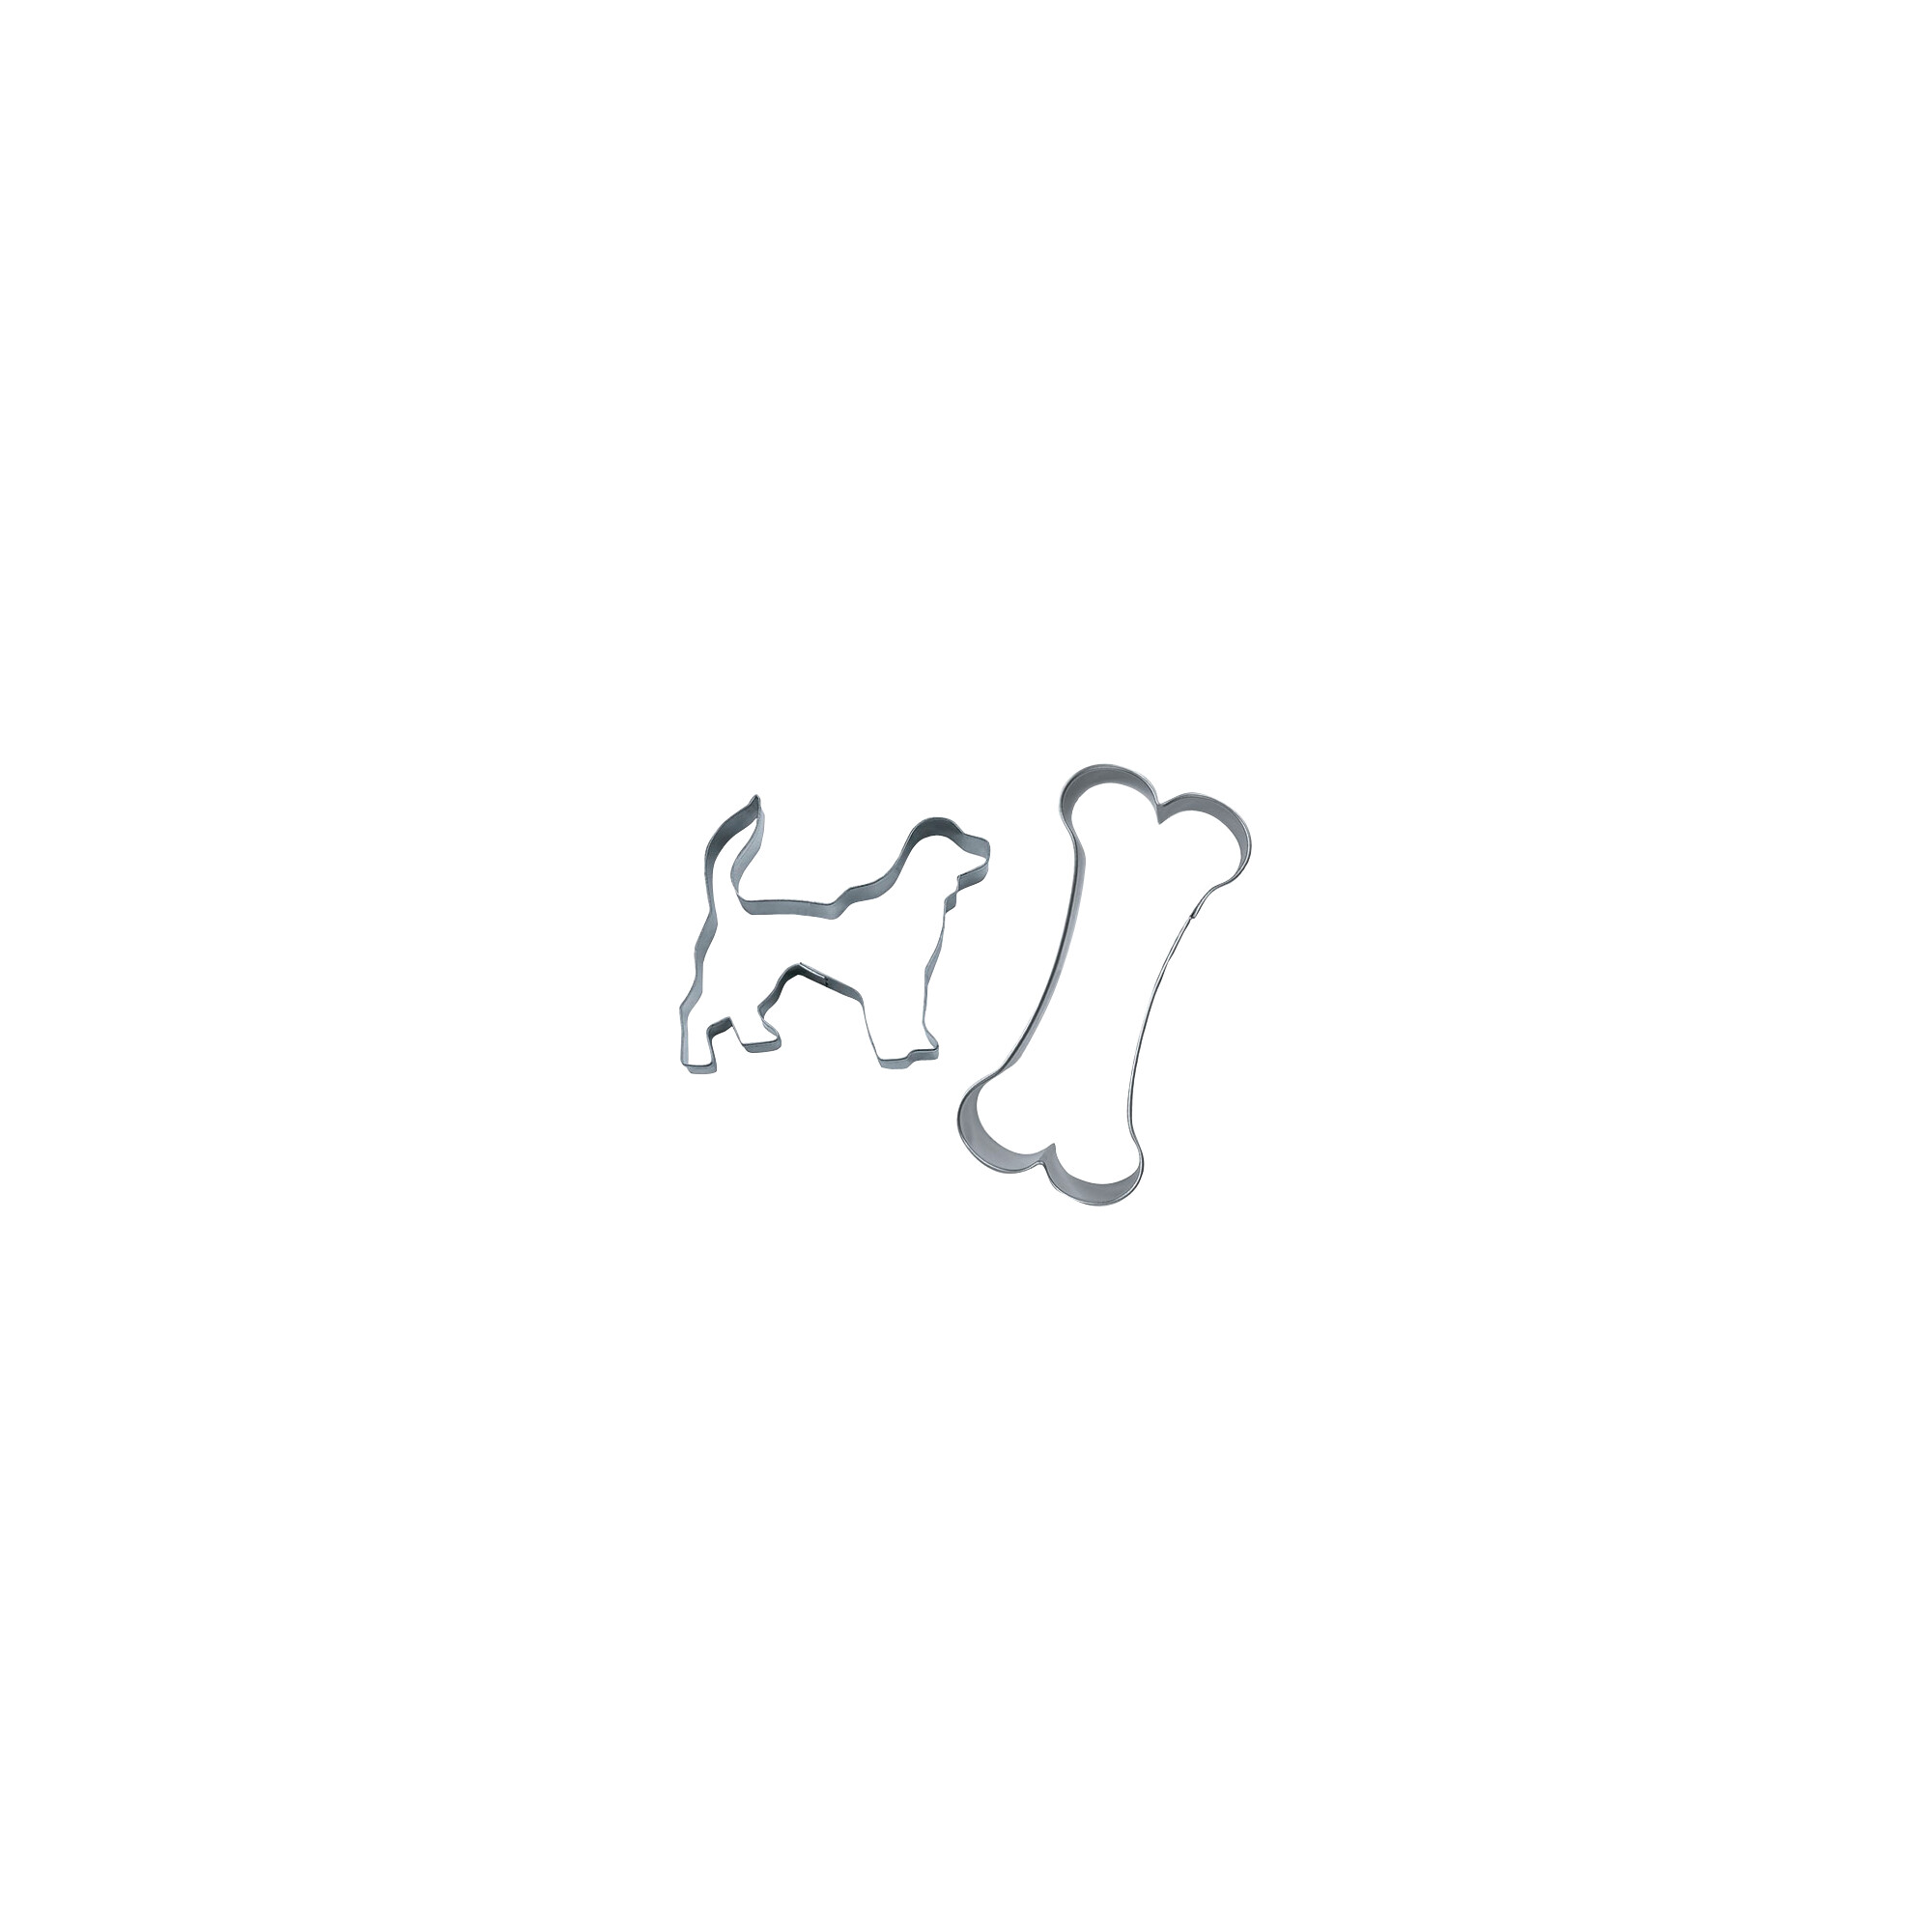 Ausstecher - Hundeparadies - Set, 2-teilig